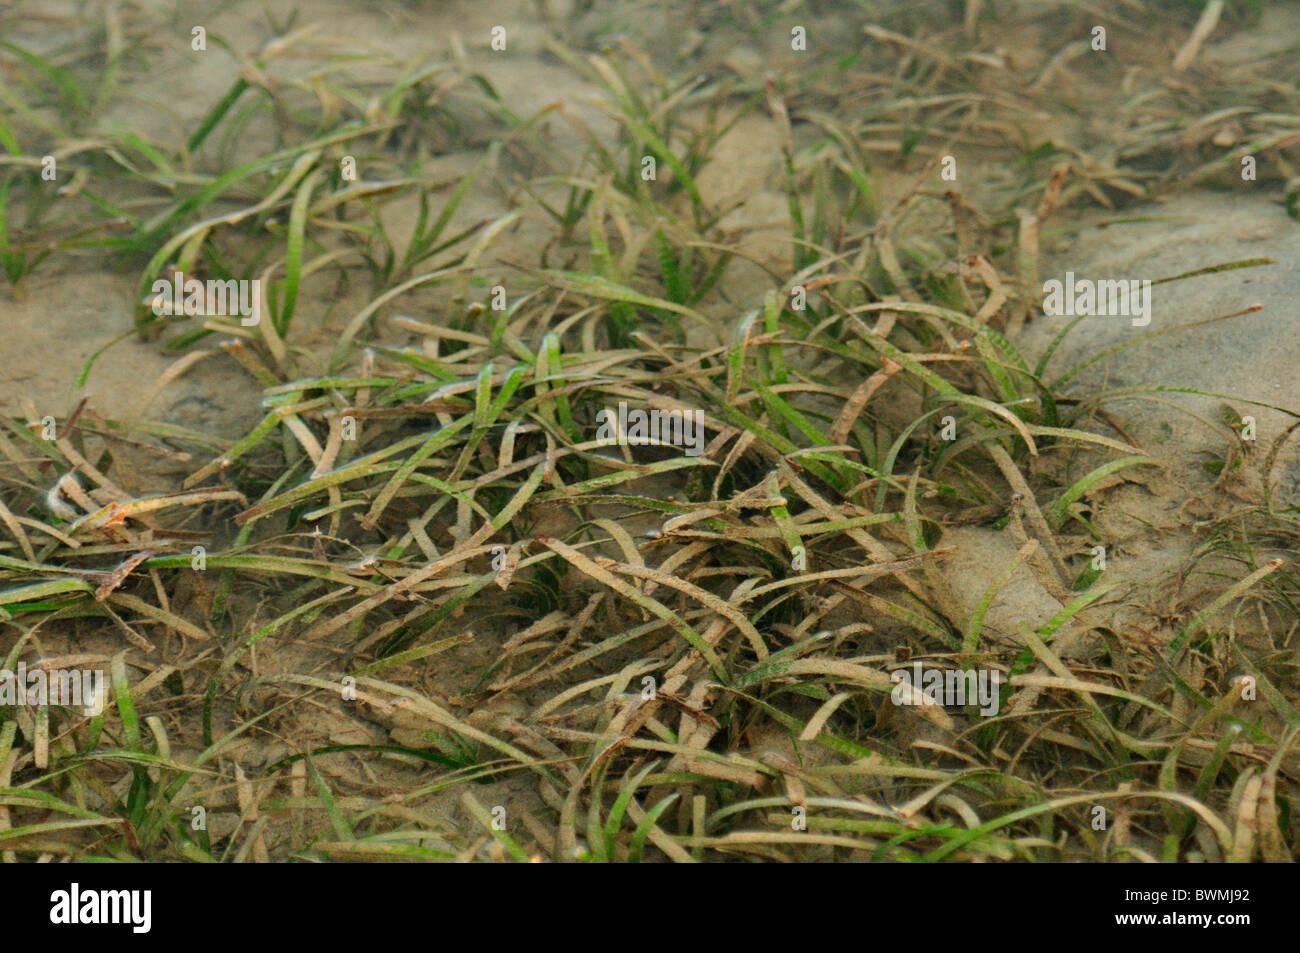 Les herbiers ruban dentelé Cymodocea serrulata, Potamogetonaceae mangroves, plage de la Baie d'Munjangan, Bali, Indonésie, Asie Banque D'Images